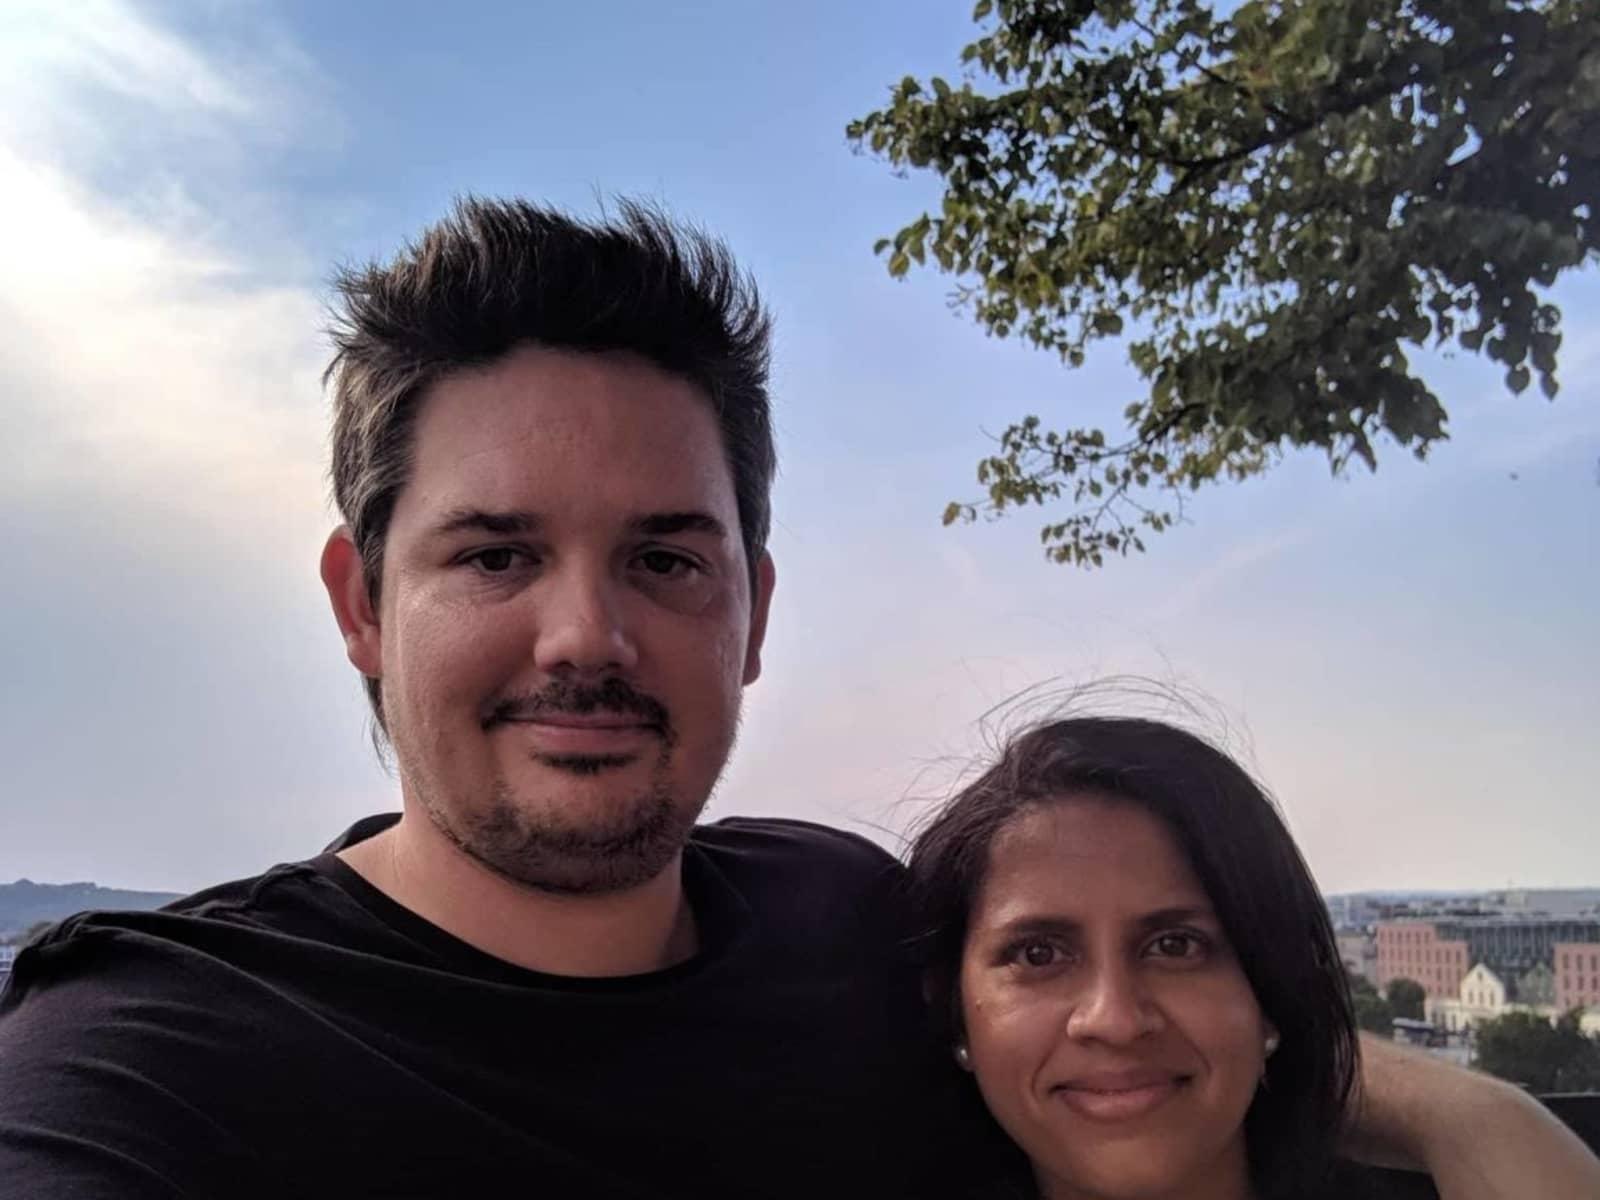 Joe & Shereen from Perth, Western Australia, Australia